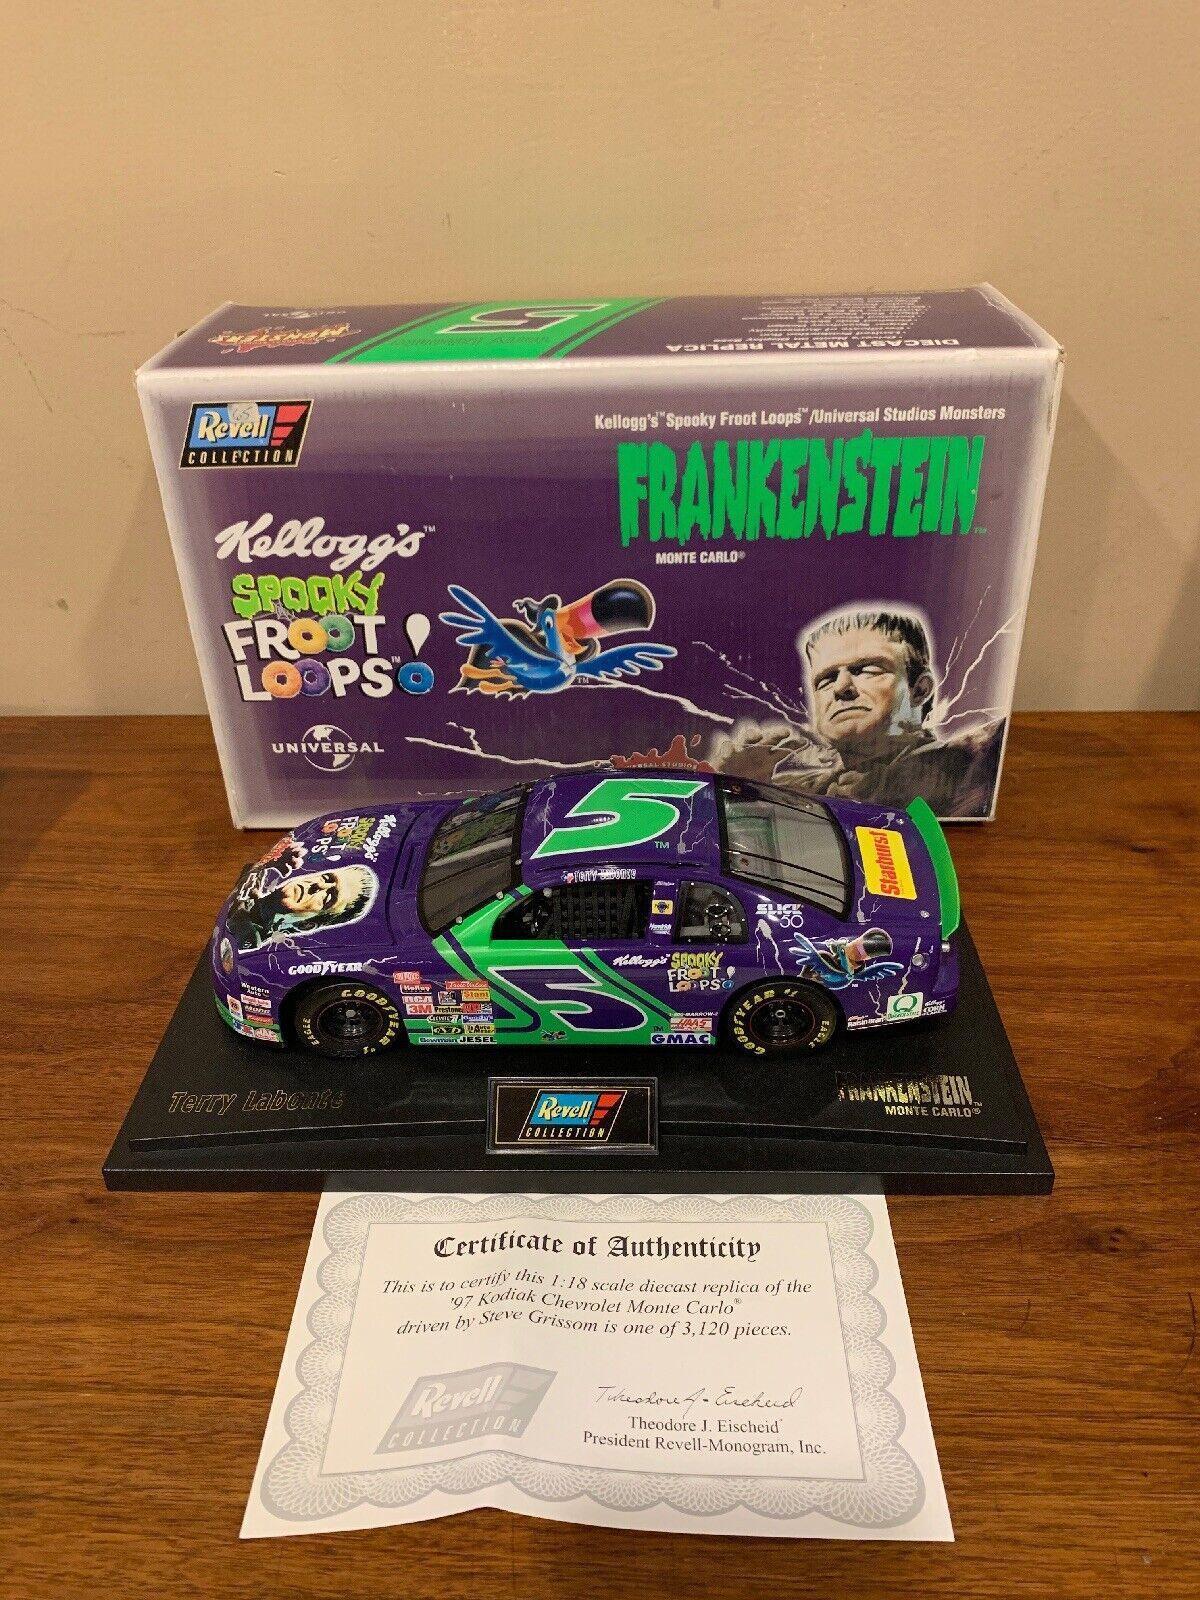 1997 Revell  5 Terry LaBonte-Frankenstein 1 18th Scale Nascar